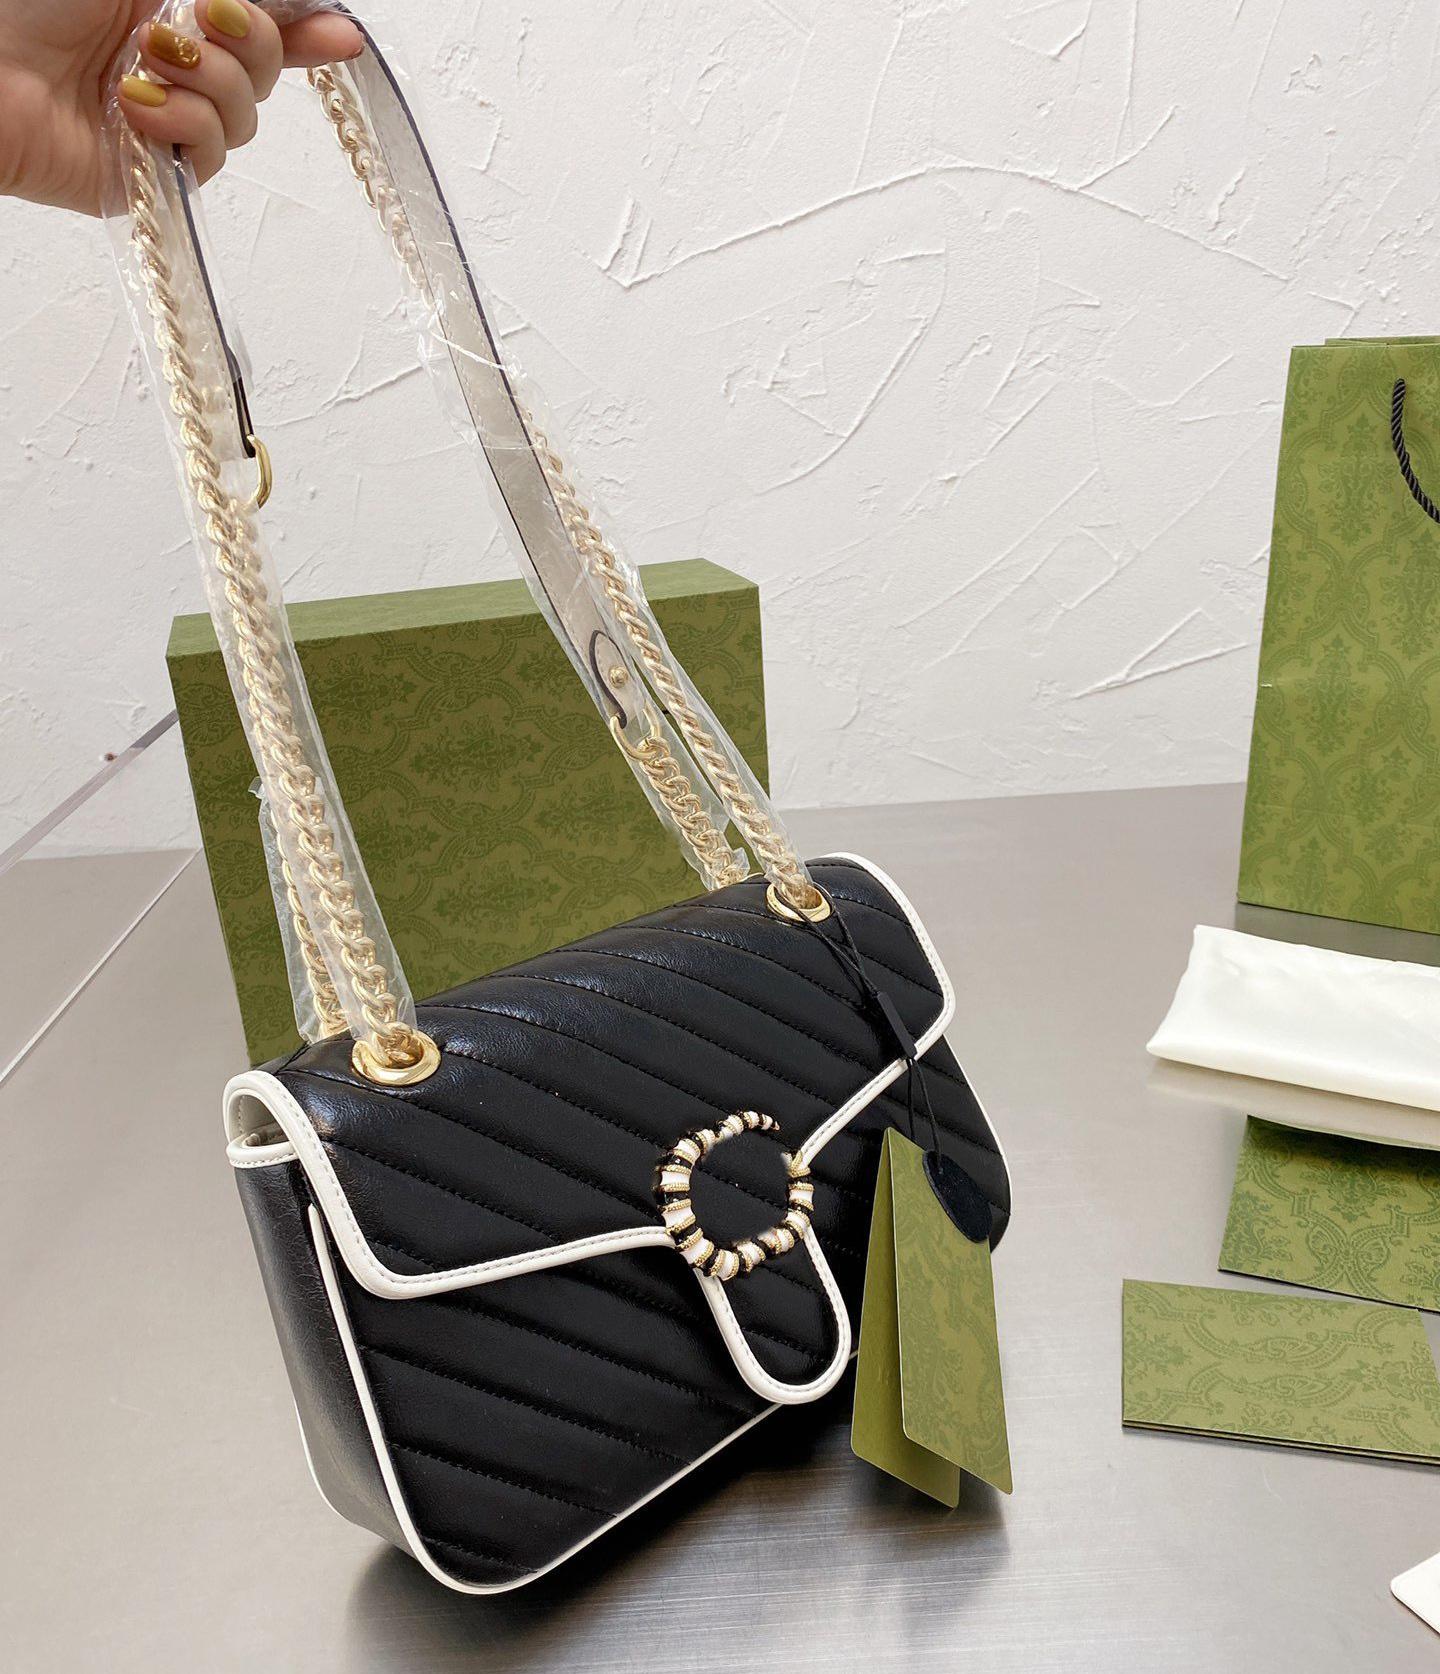 Designer Crossbody Tote Borsa a tracolla Messenger Handbag Portafoglio Sella borsa Lvlouis Zaino con logo GUCCI A68